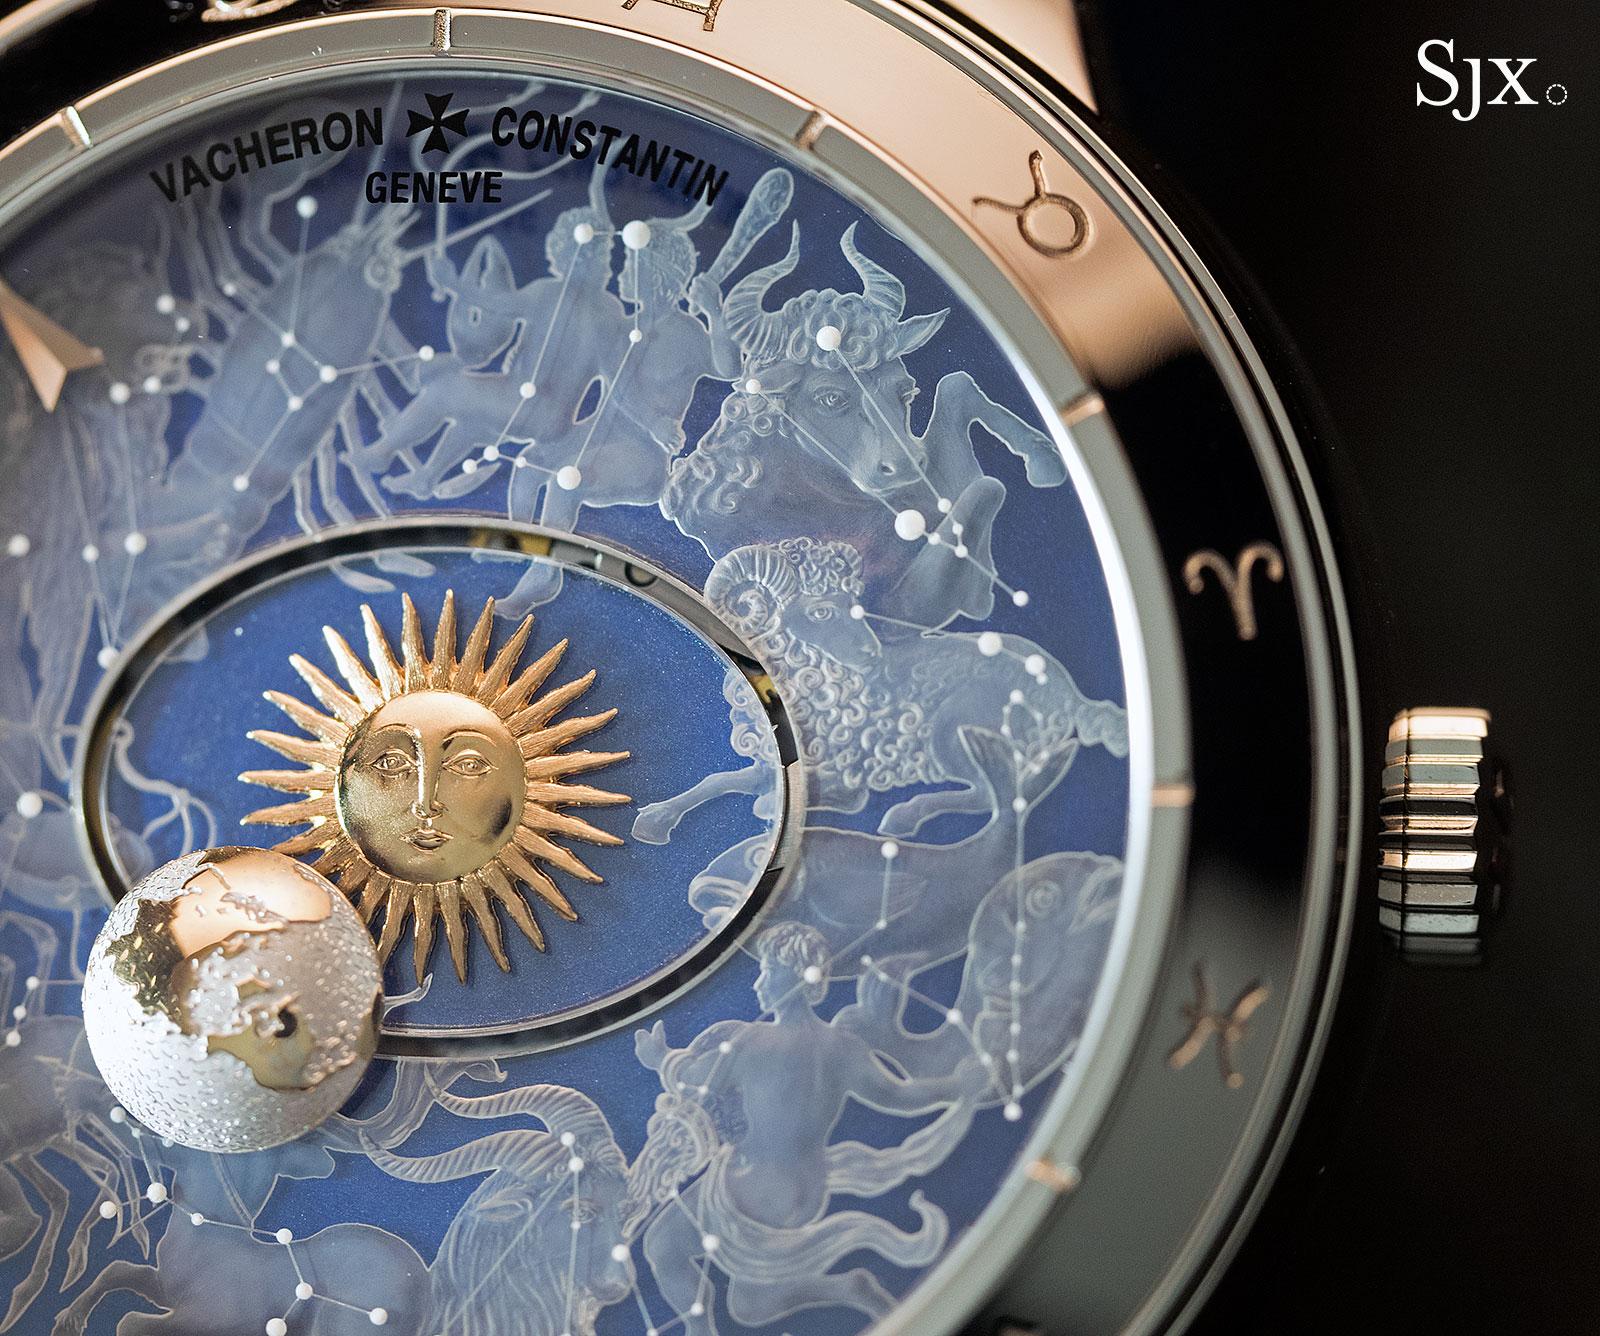 Vacheron Constantin Copernicus sapphire 2